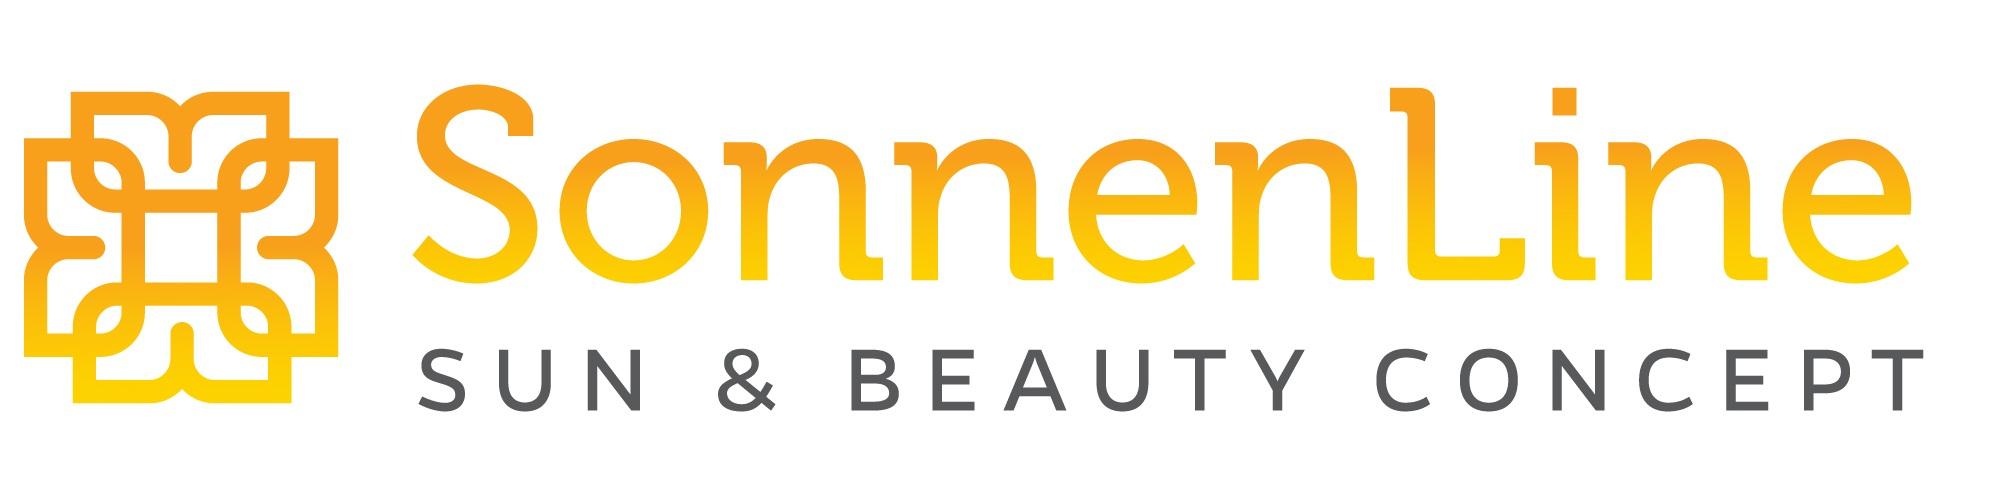 Sonnenline Sun&Beauty Concept - Iasi